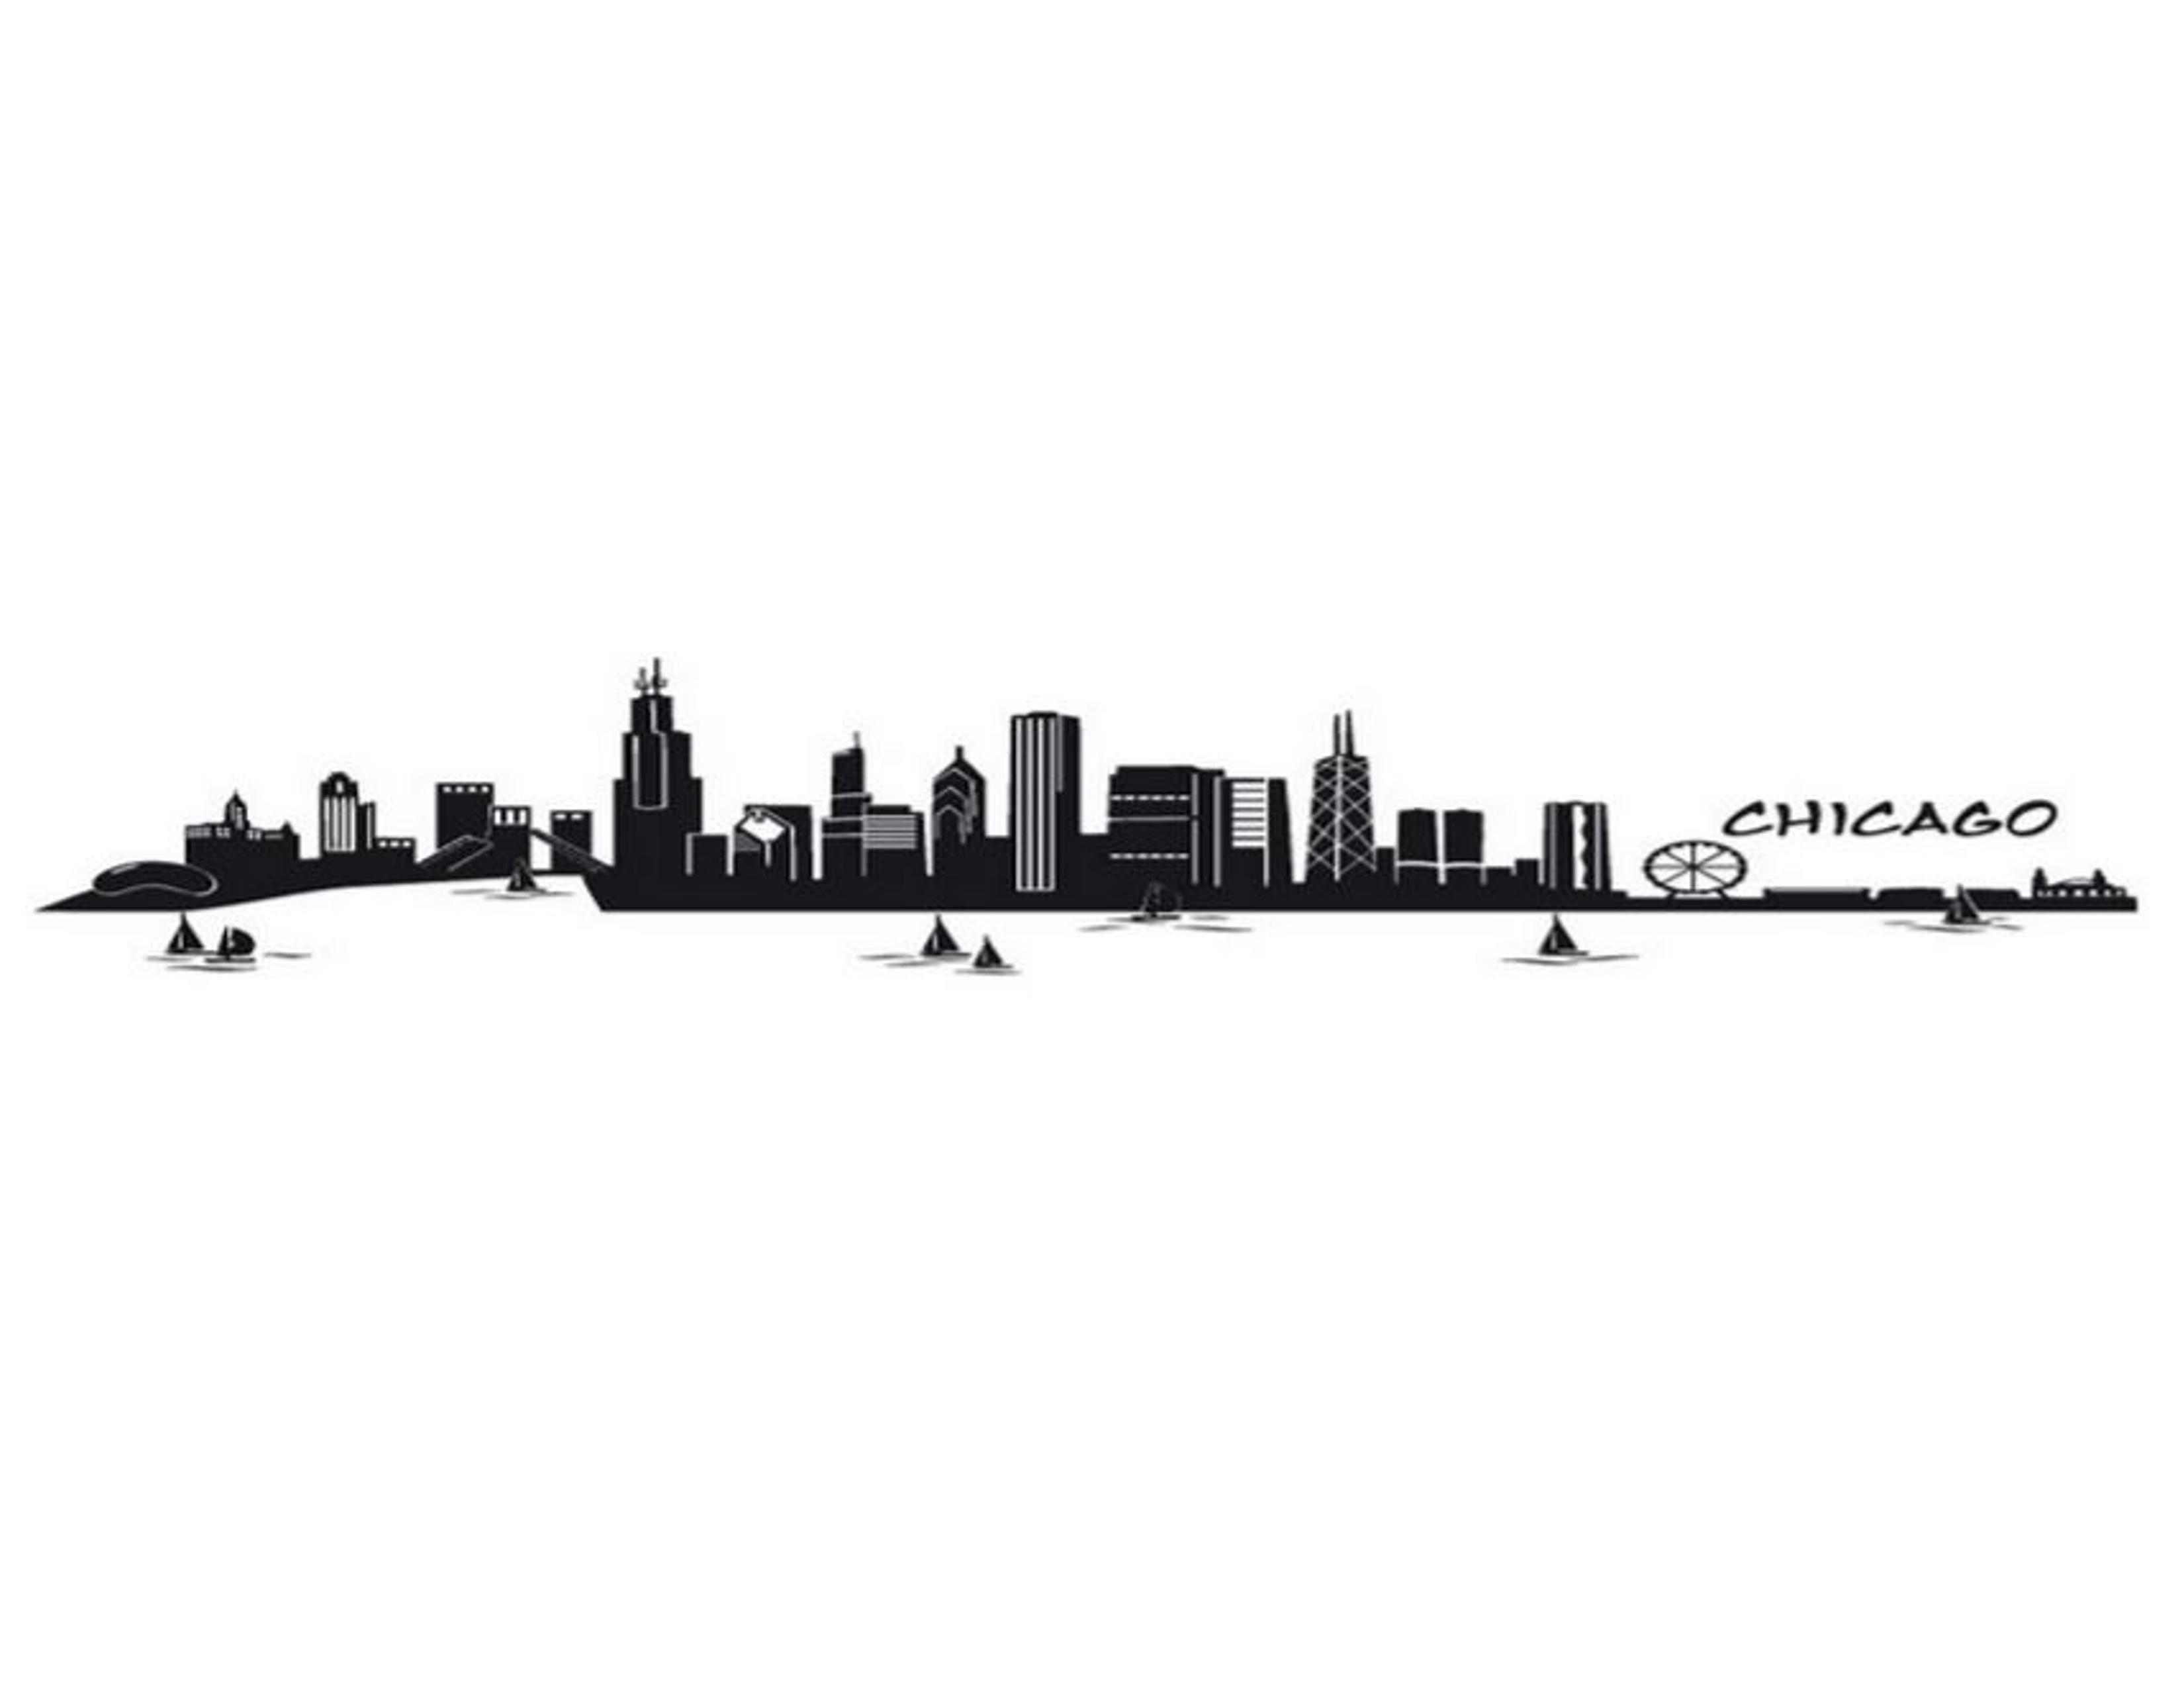 Chicago Skyline Cityyearchicagocivicengagement Painting 5 Indoor Teacherslounge Hallways Mural Chicagoskyline